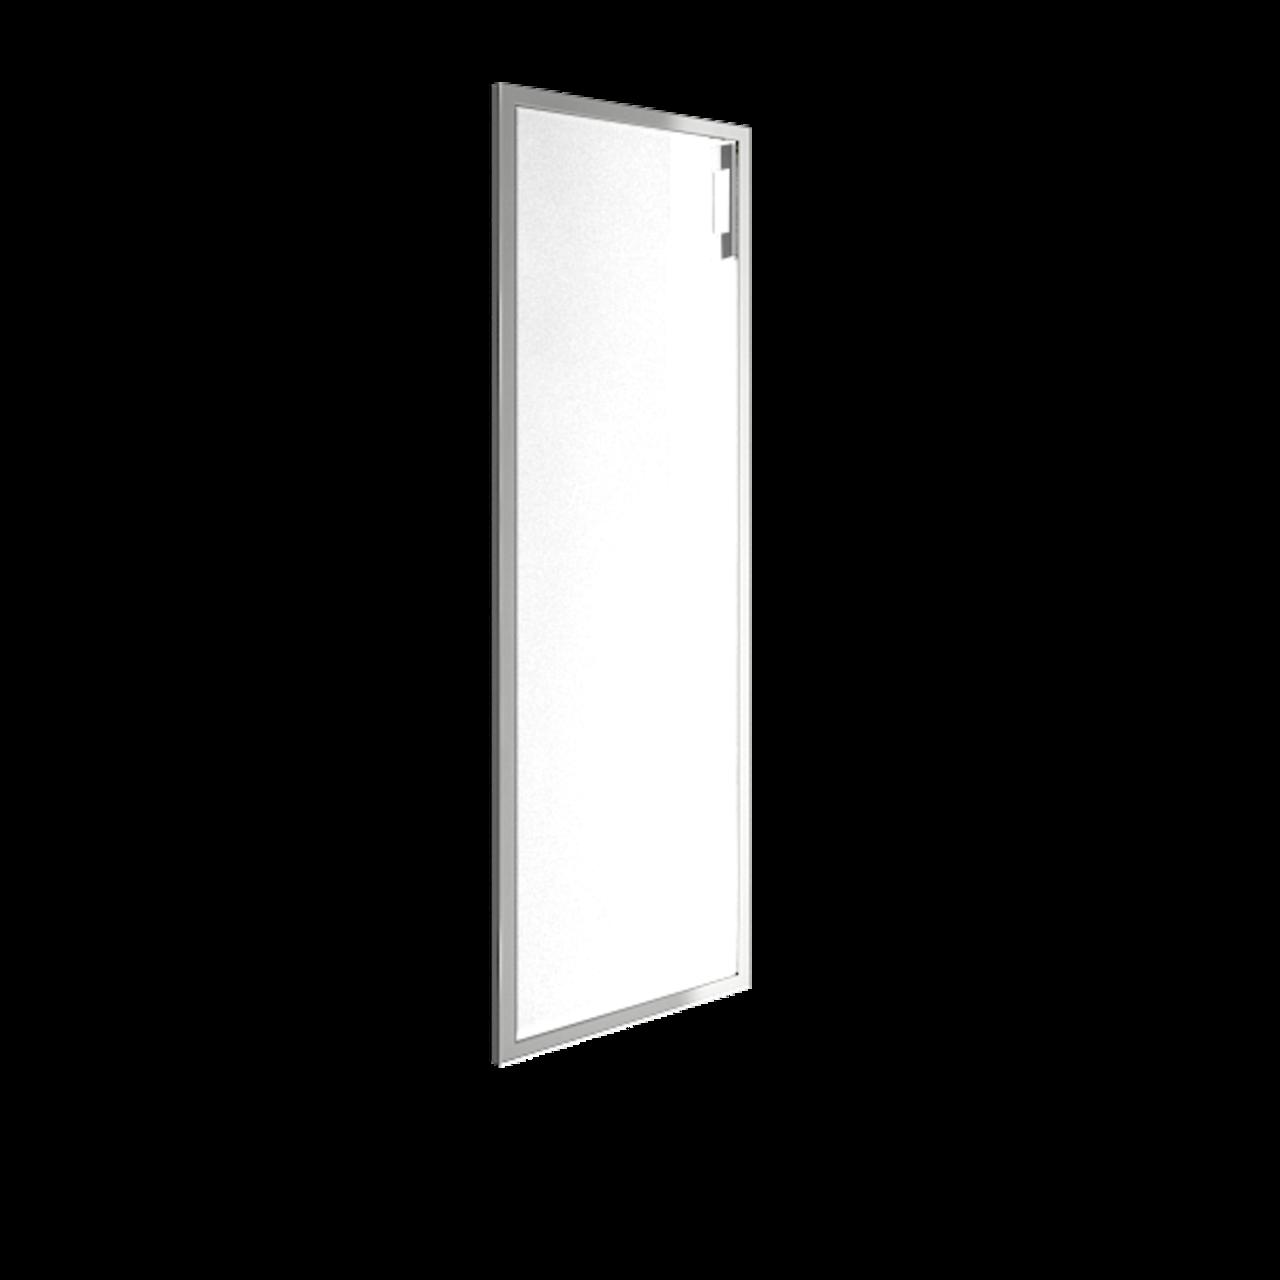 Дверь стекло в раме среднее Lacobel white левая - фото 3